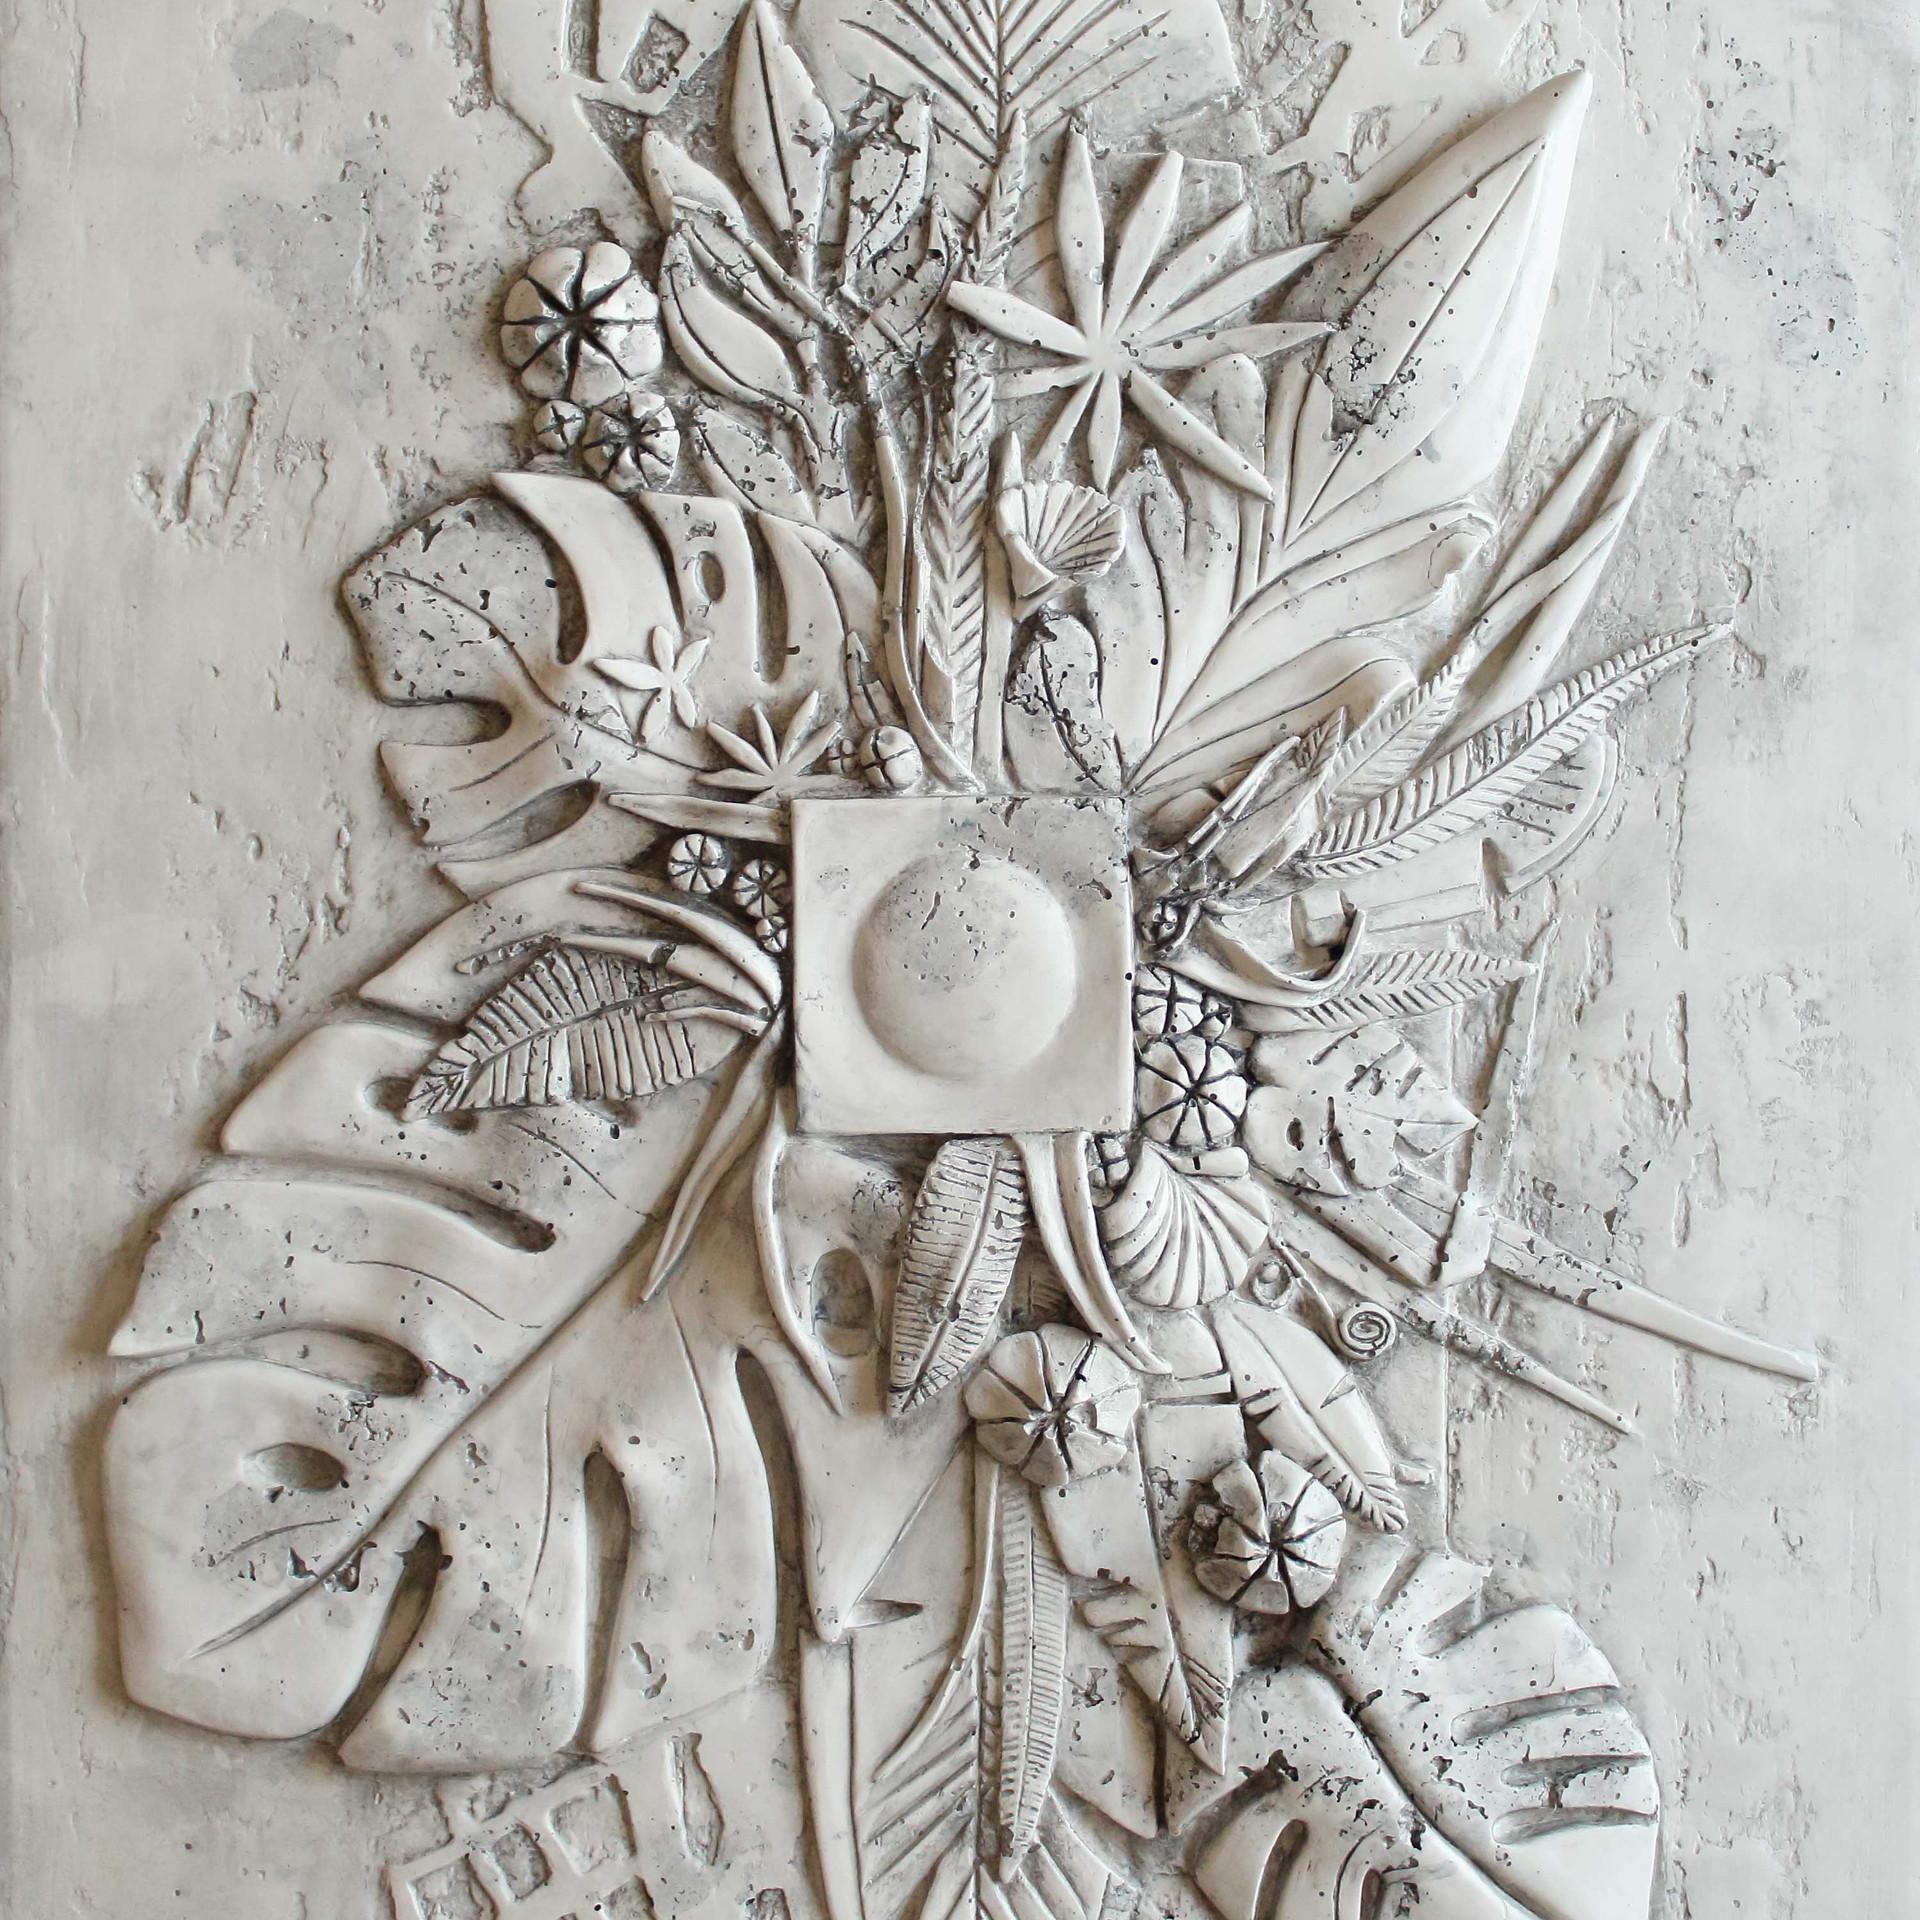 blossom-gray-stone-bez-logo.jpg